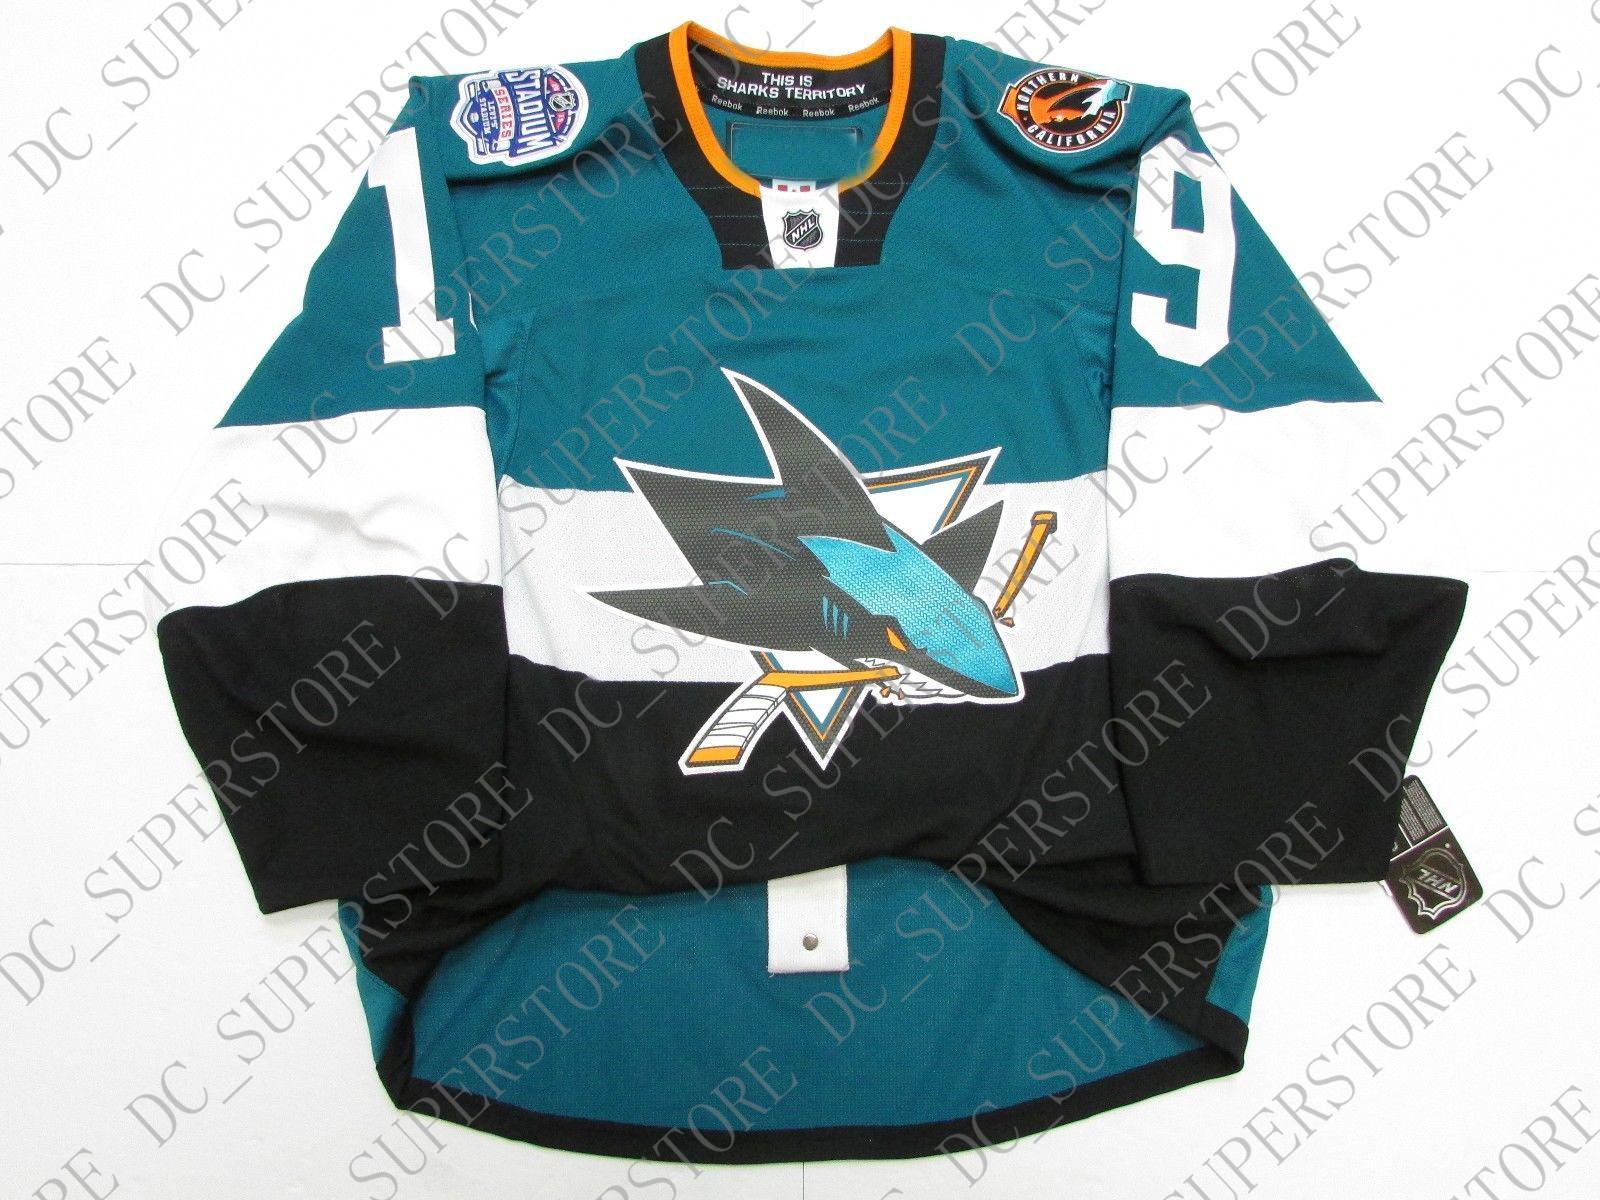 wholesale dealer 75285 57060 Cheap custom JOE THORNTON SAN JOSE SHARKS 2015 STADIUM SERIES JERSEY stitch  add any number any name Mens Hockey Jersey XS-5XL